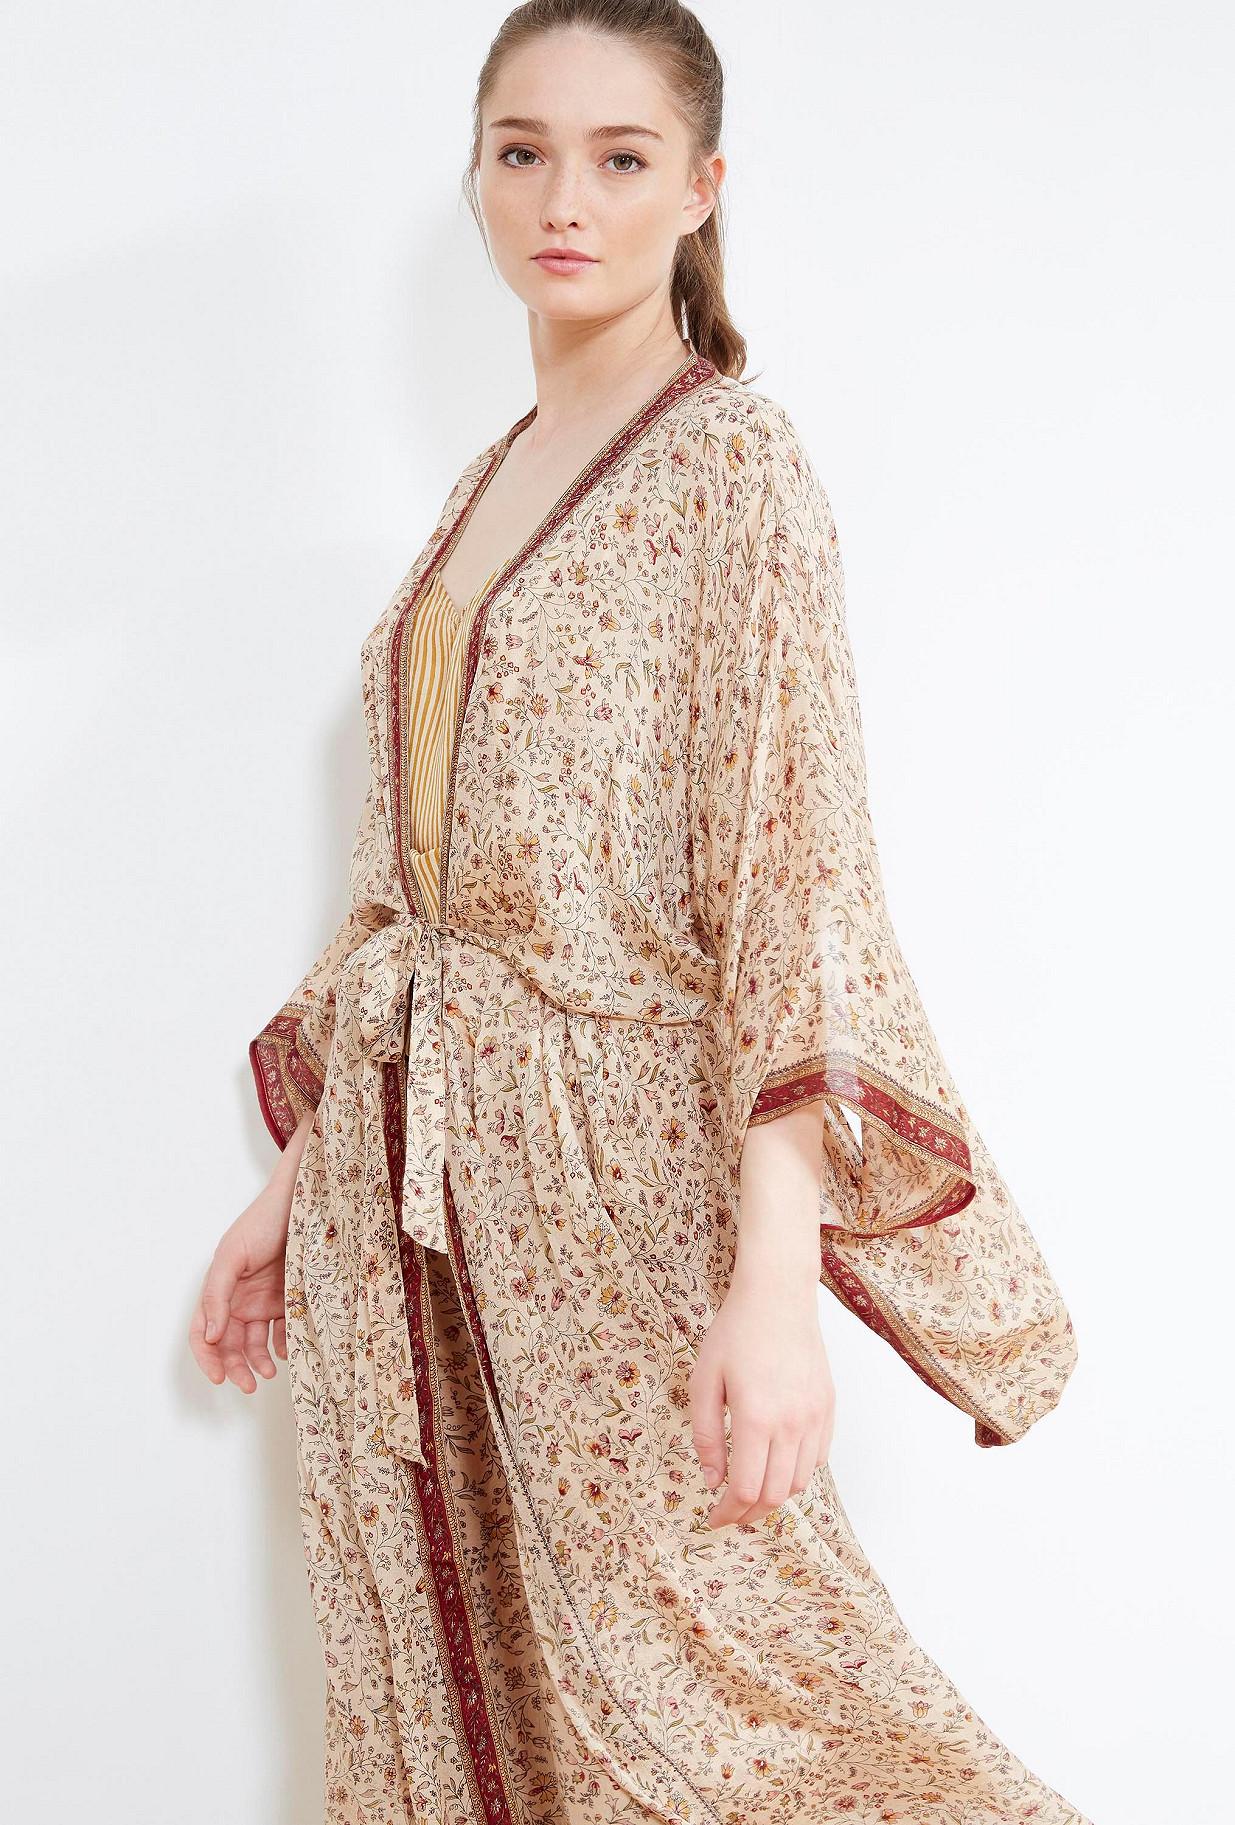 Kimono Femme Soie Simple Edarter Soie Paon Fleur Robe De Chambre